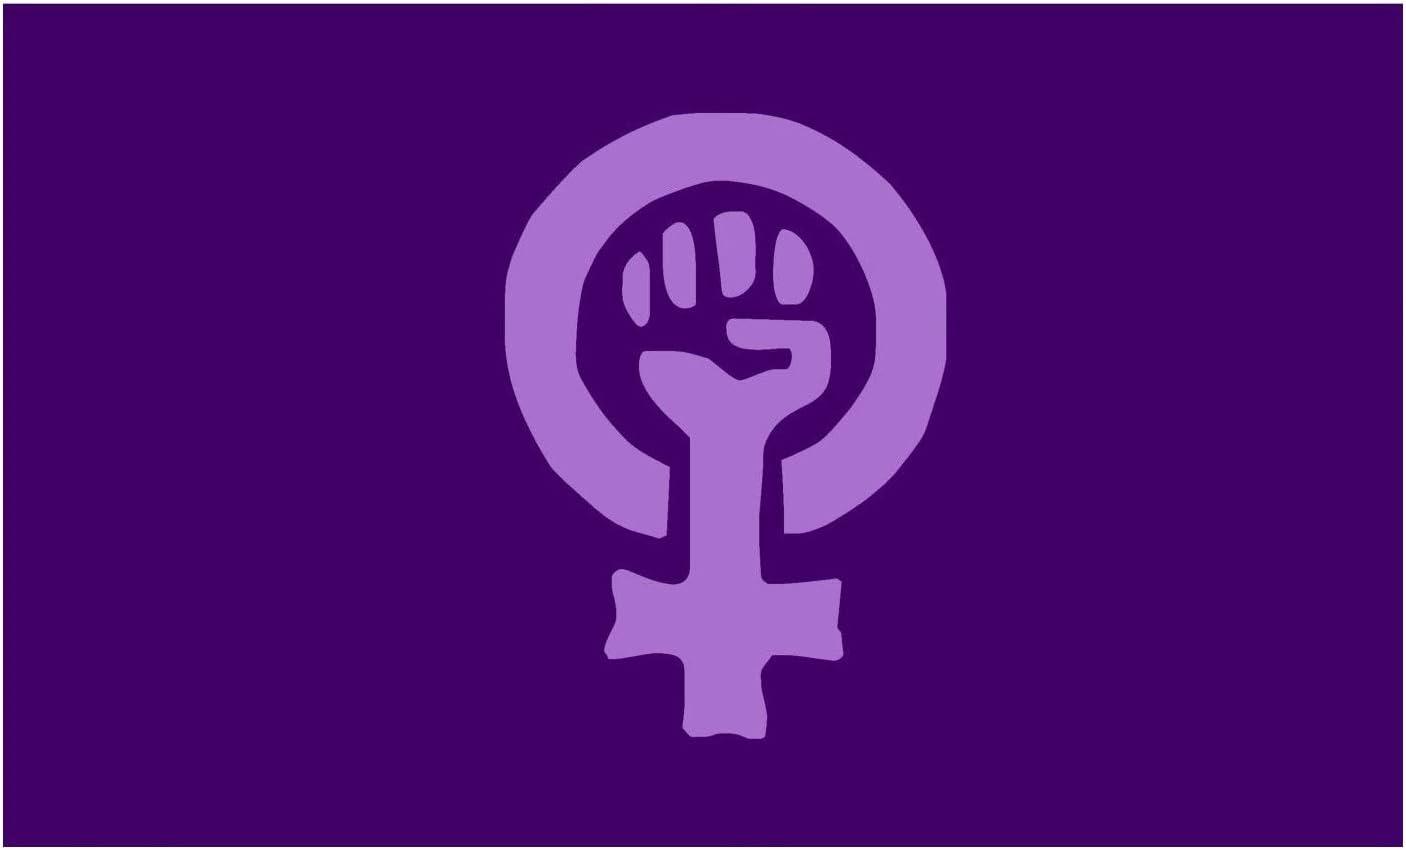 Durabol Bandera de Feminista 150 X 90 CM Flag: Amazon.es: Hogar